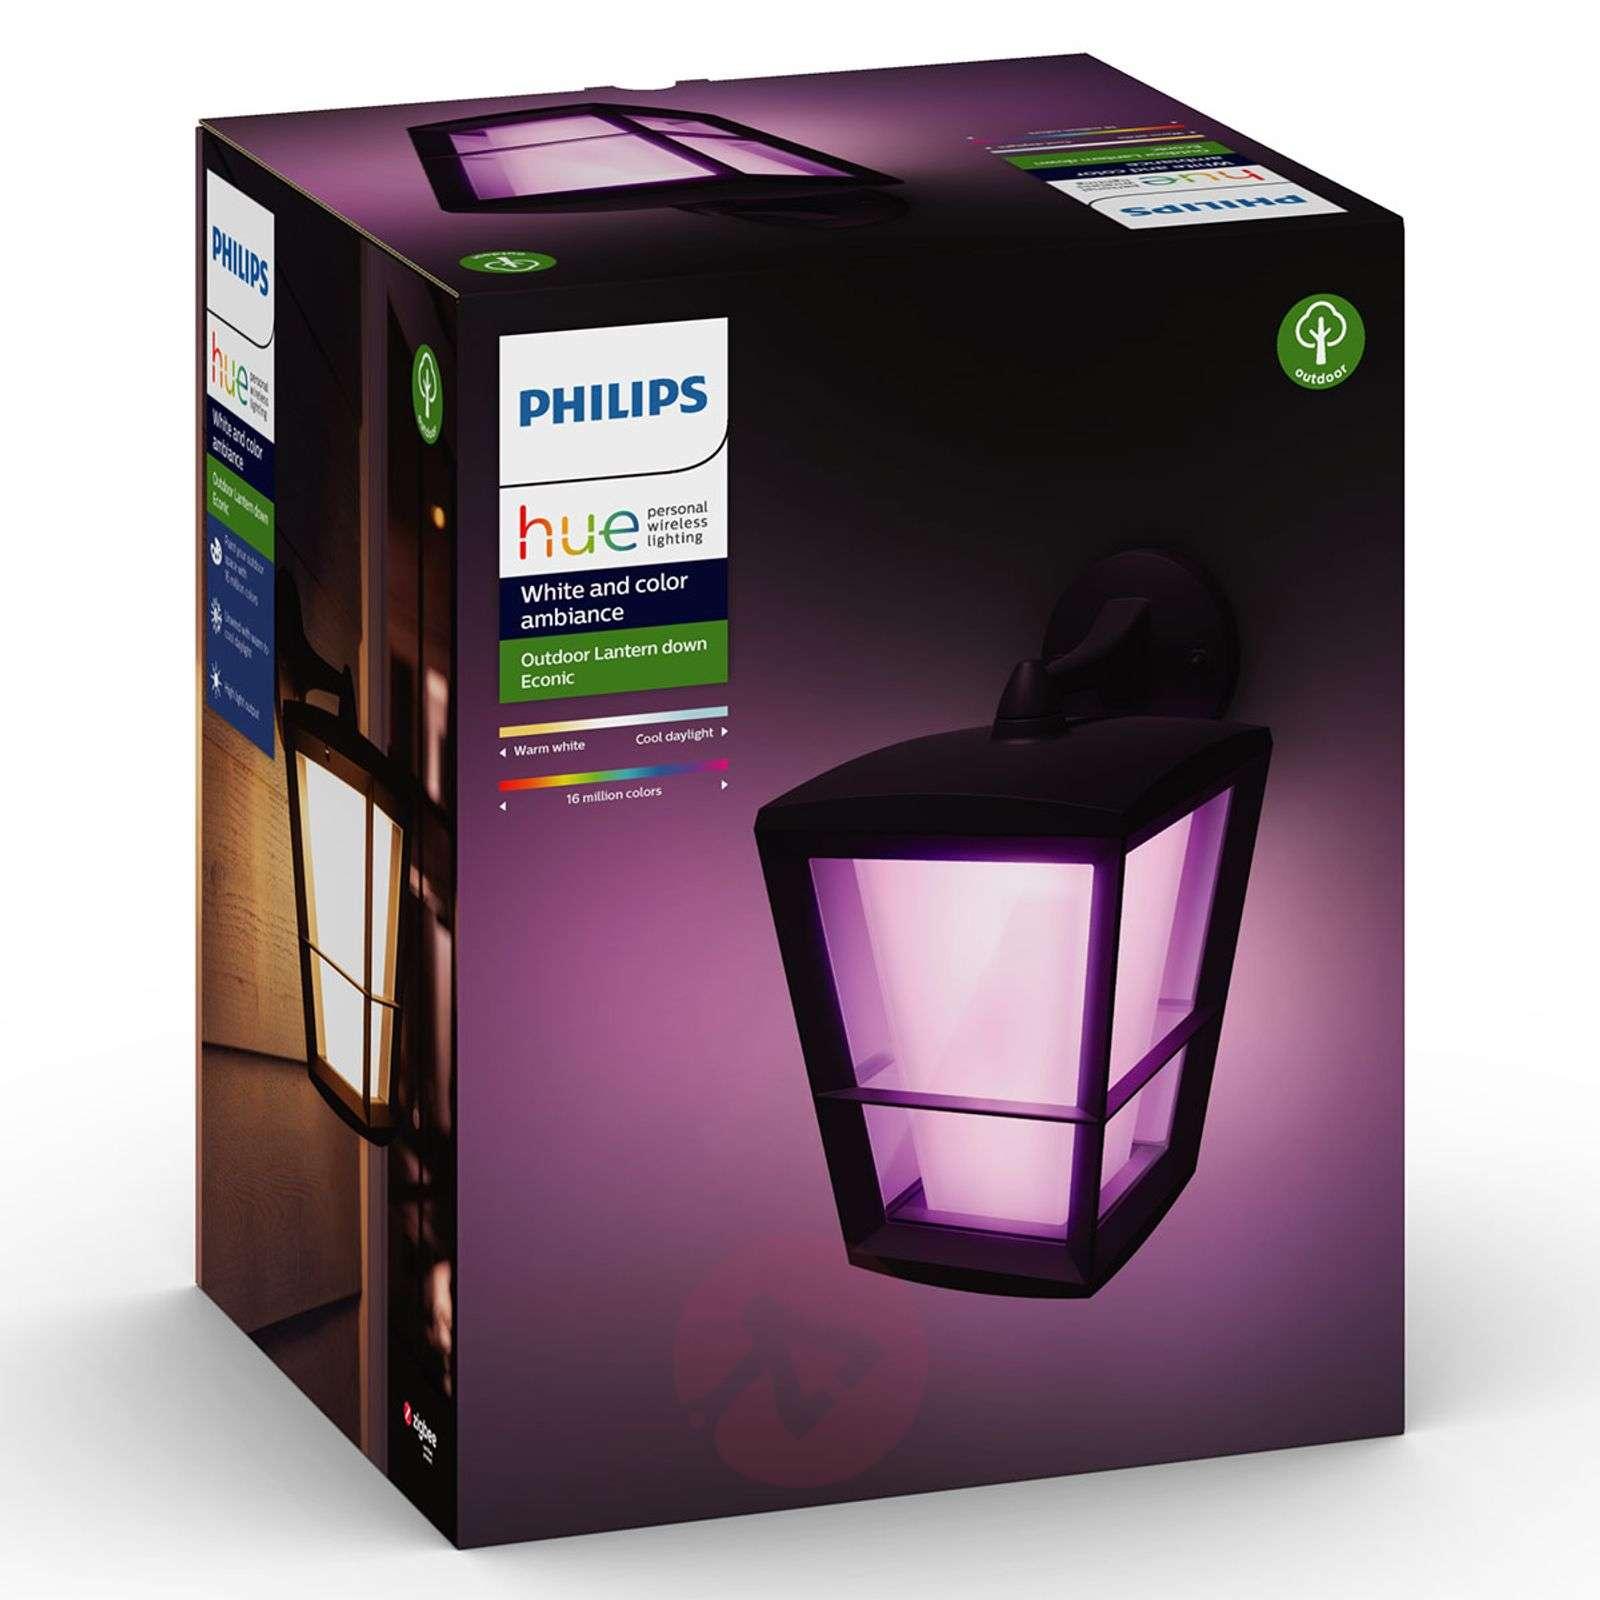 Philips Hue White+Color Econic seinävalaisin, ala-7534118-02